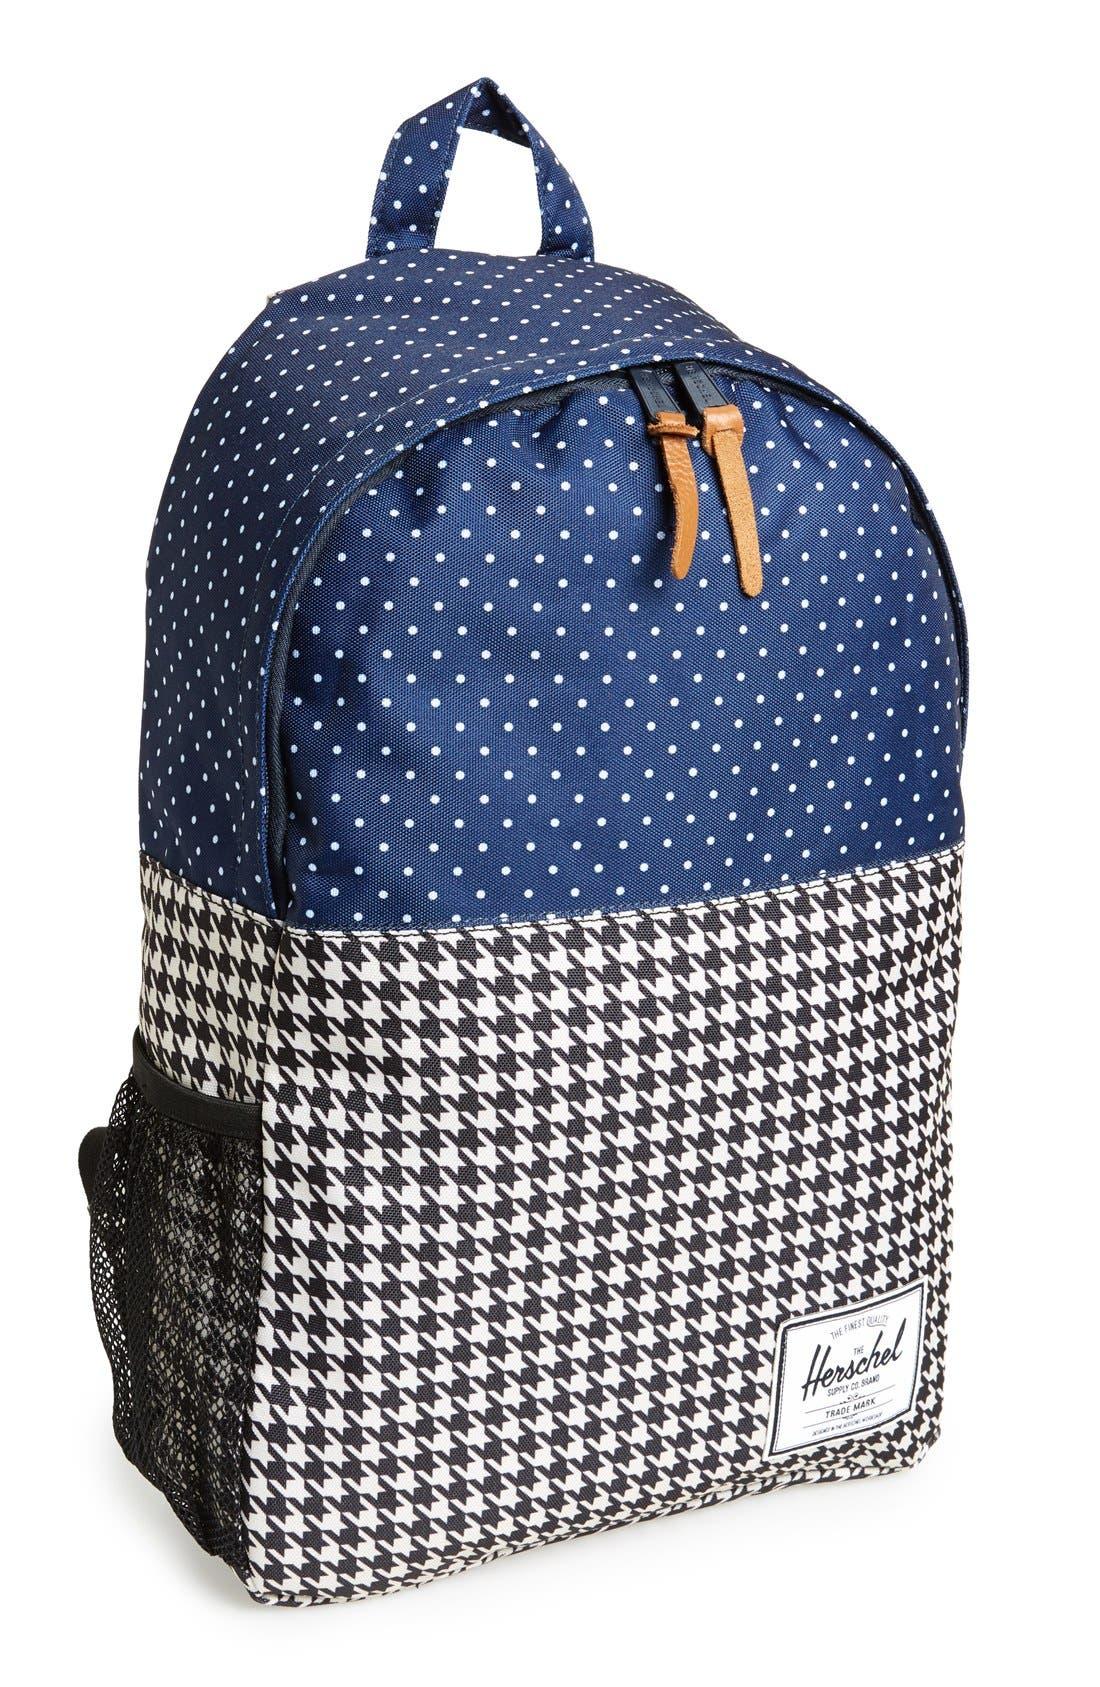 Main Image - Herschel Supply Co. 'Jasper' Backpack